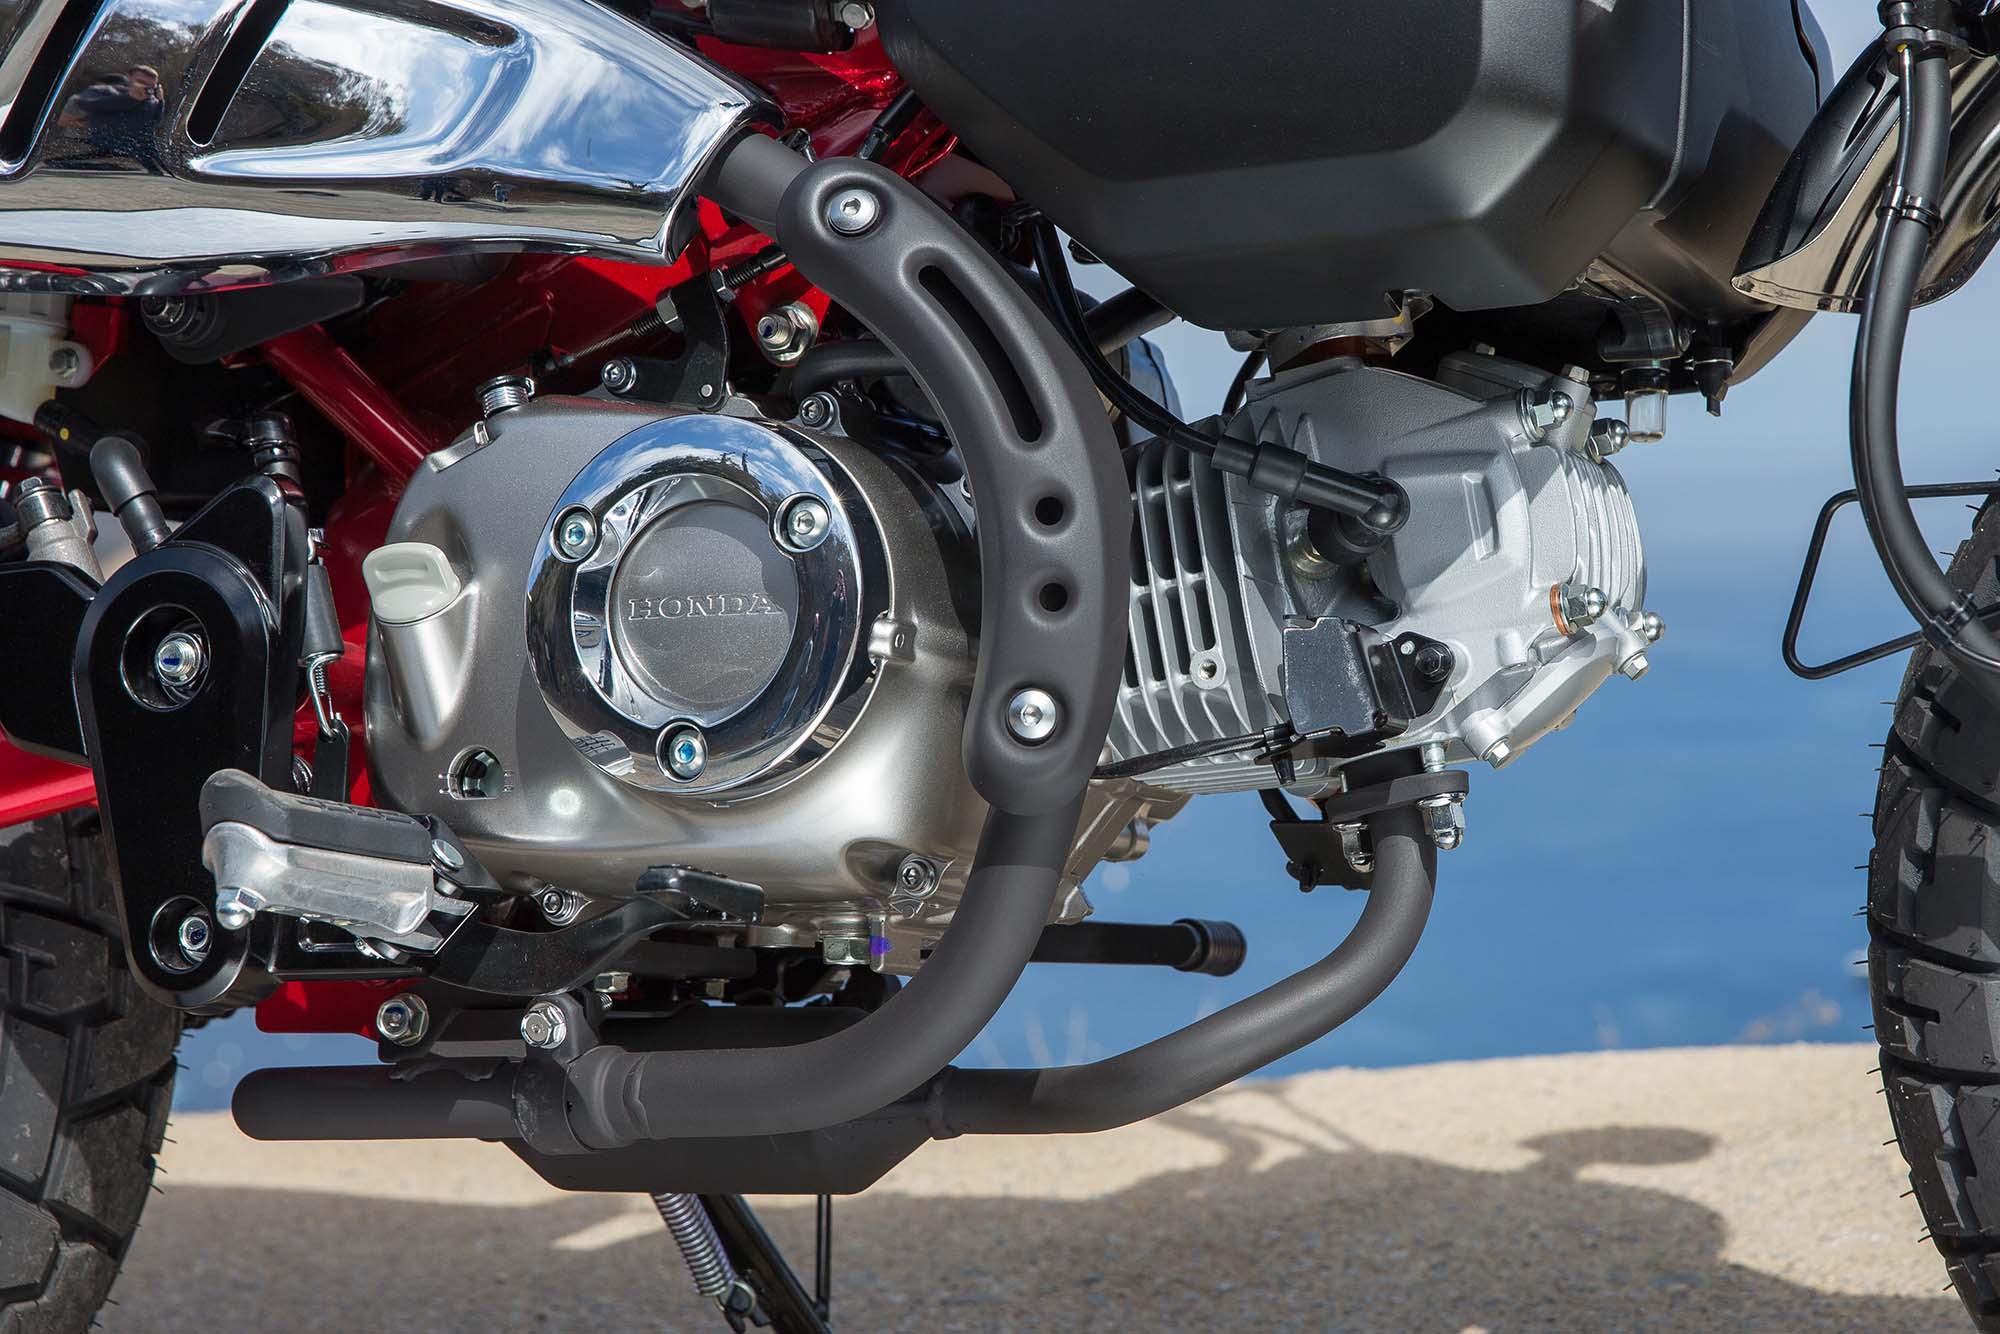 A Review Of The Honda Monkey Mini Moto Asphalt Rubber